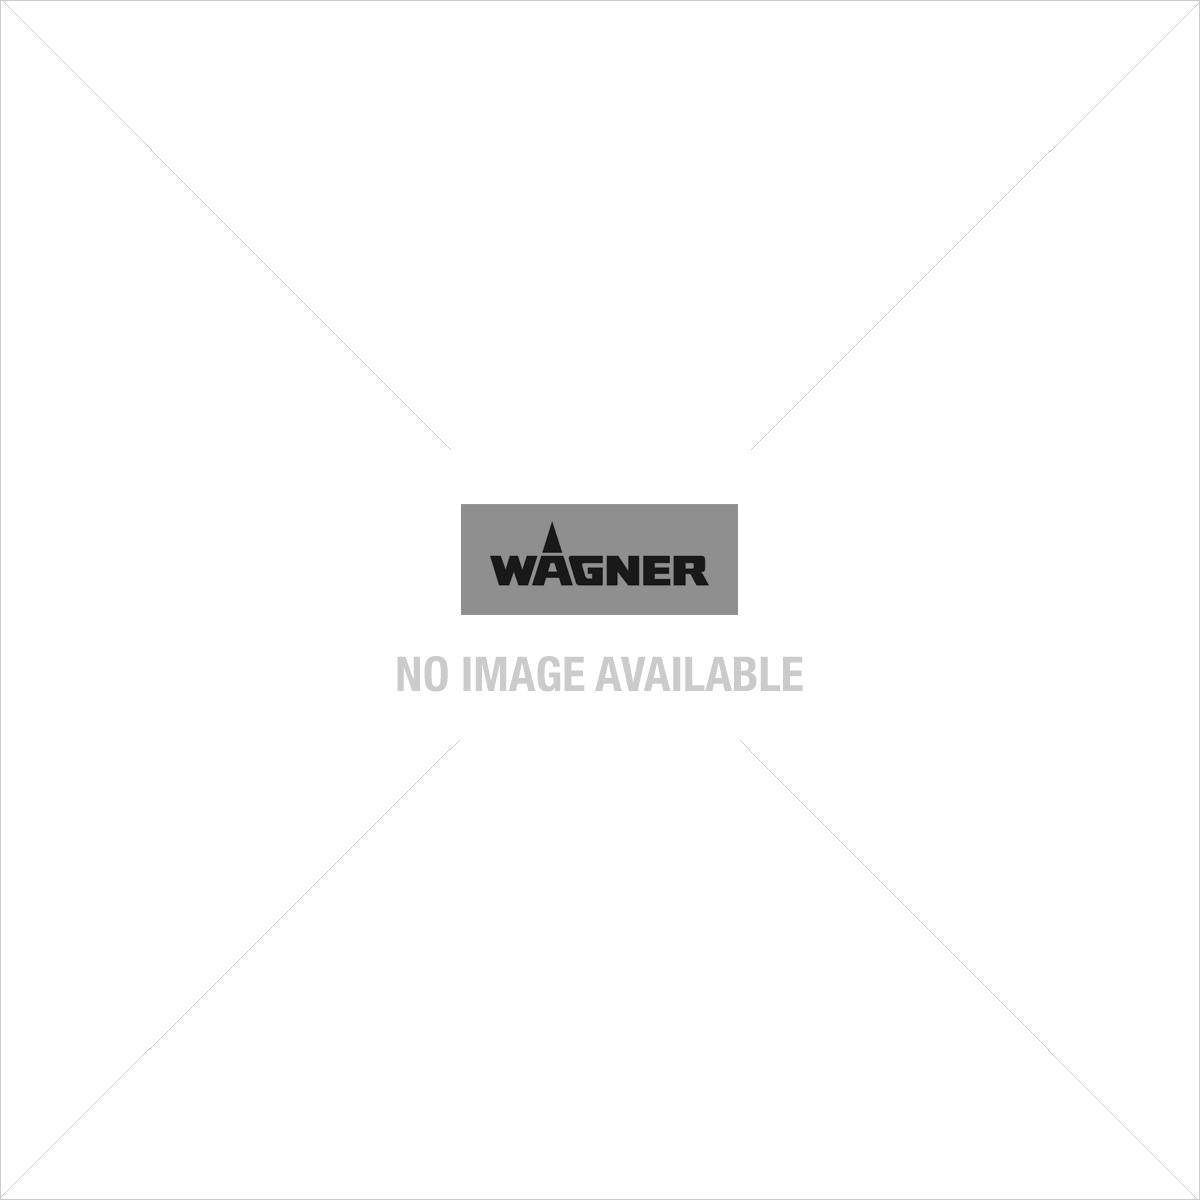 Wagner 450 SE peinture